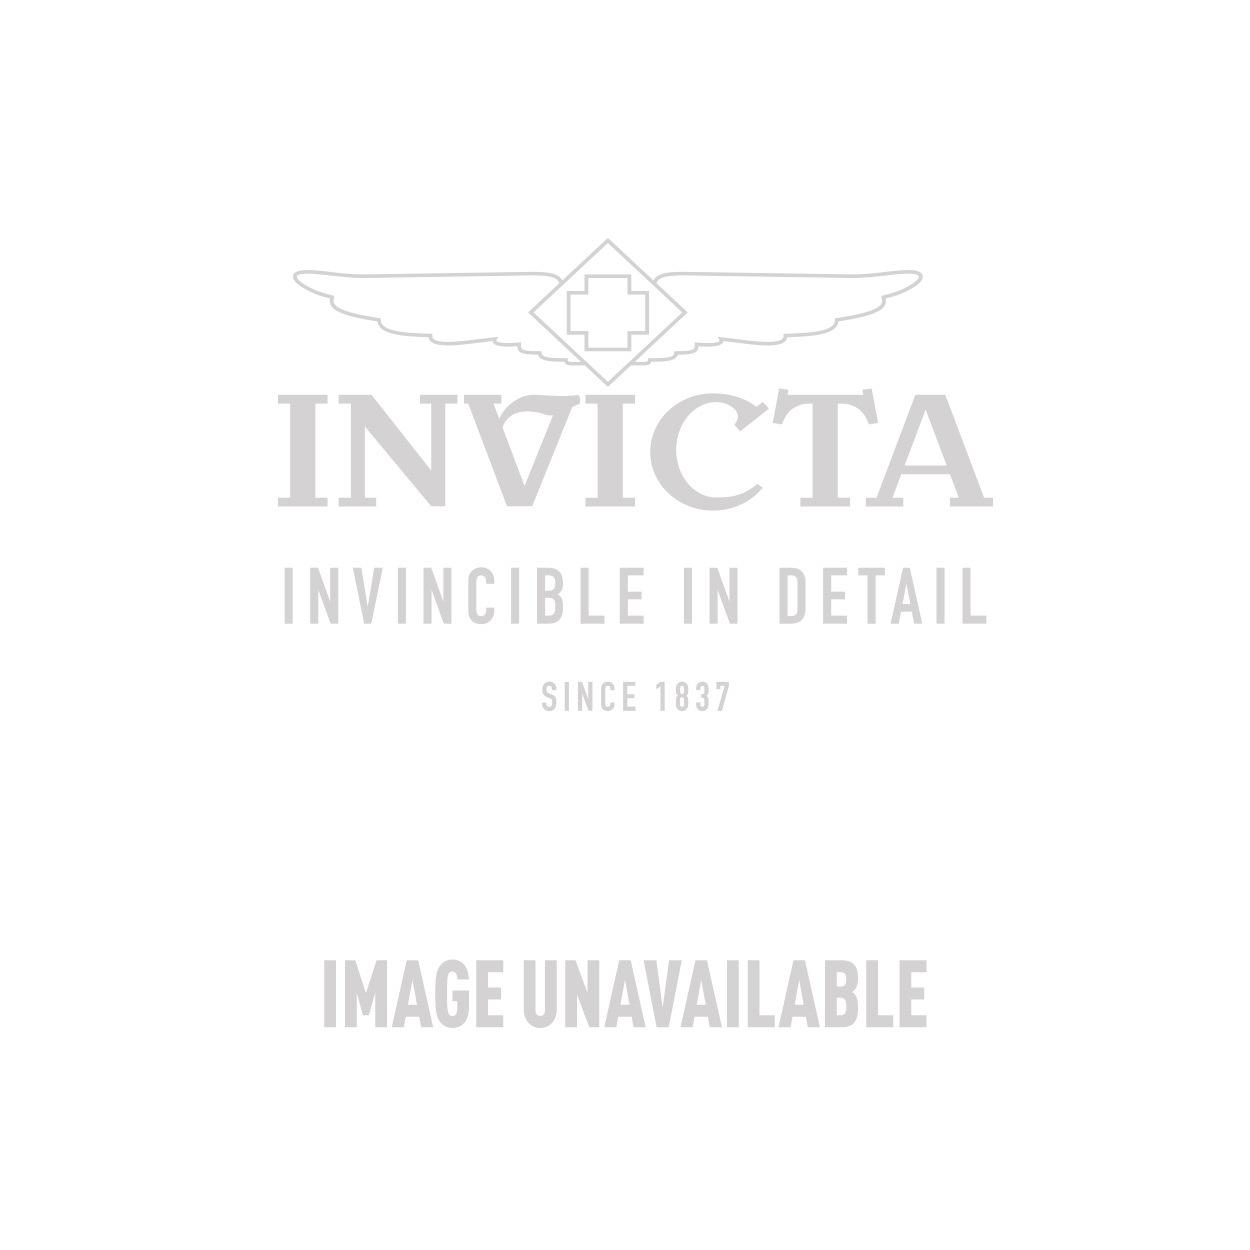 Invicta Pro Diver Quartz Watch - Gold, Stainless Steel case with Steel, Gold tone Stainless Steel band - Model 12852